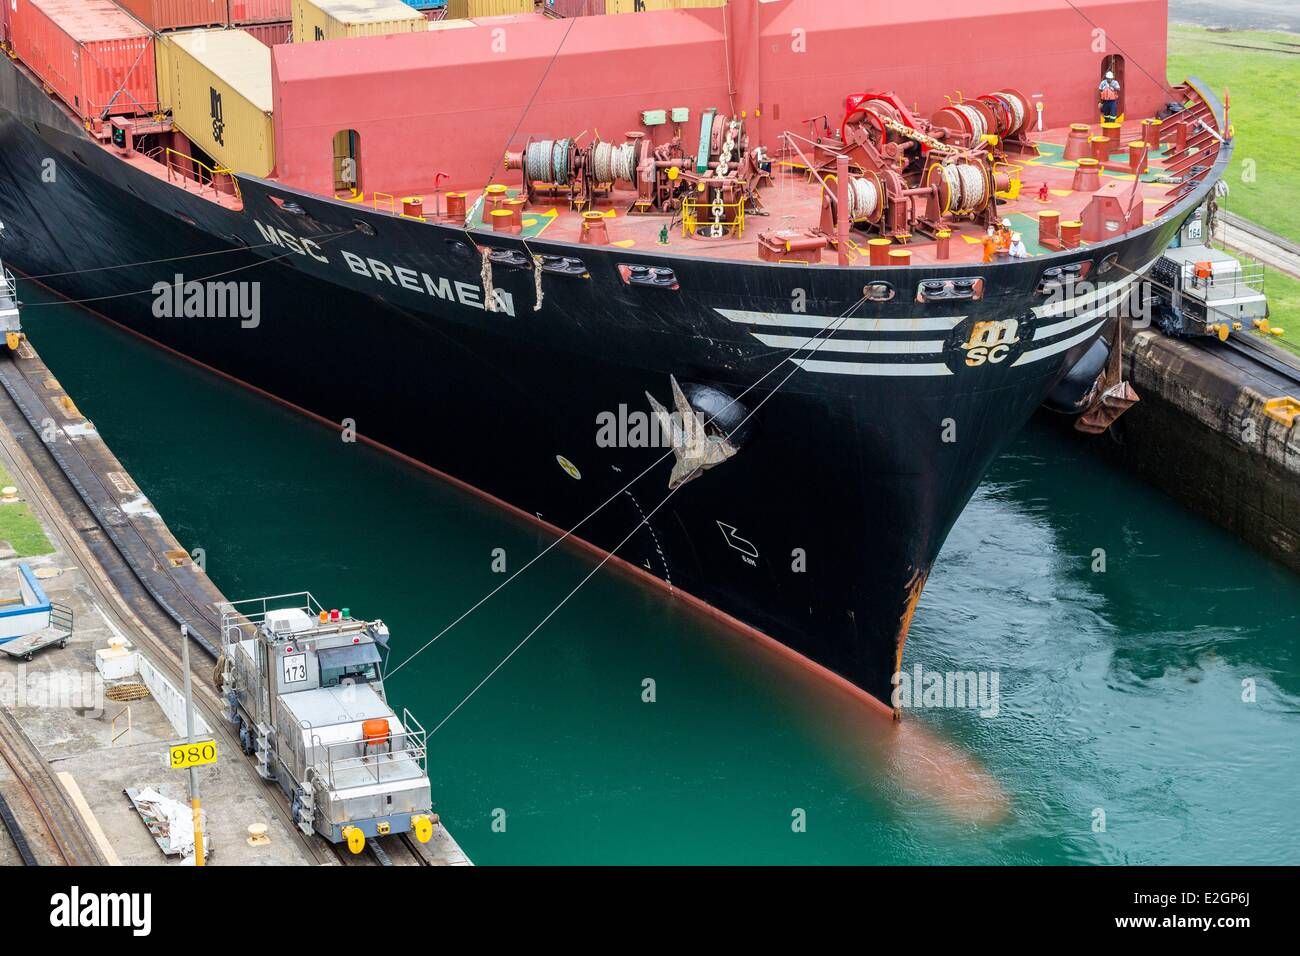 Panama Doppelpunkt Gatun-Schleusen, abgeschlossen im Jahre 1913 erbaute Panamakanal Containerschiff MSC Bremen 2007 Stockbild